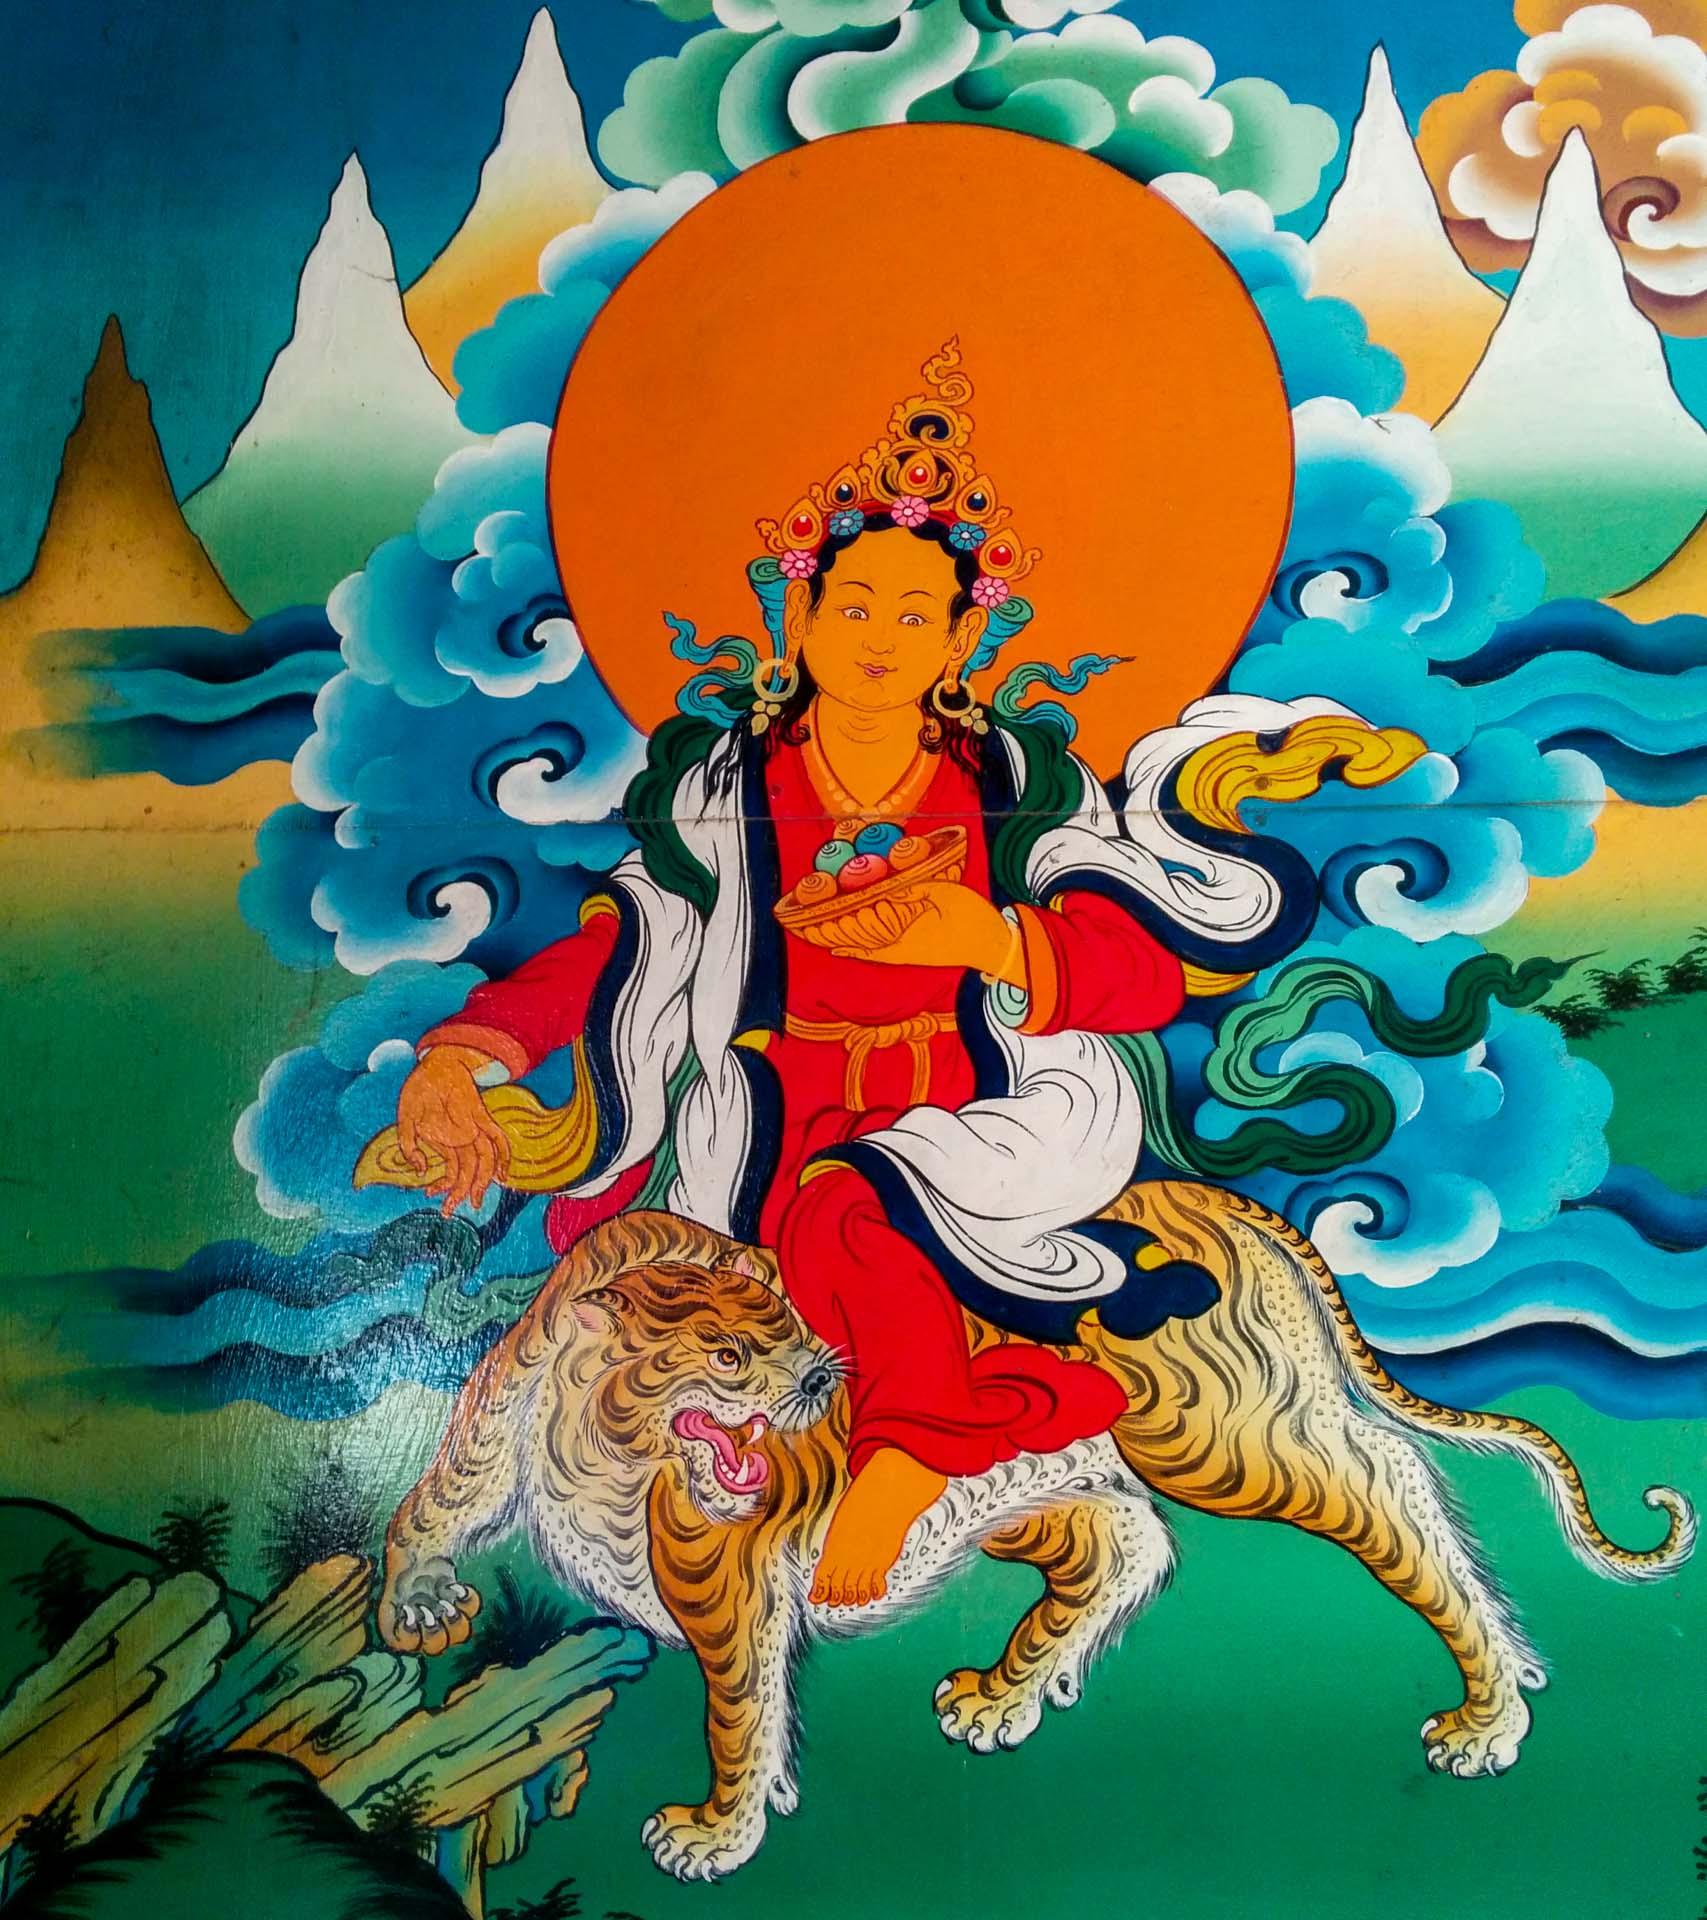 Chomolungma. Mother Goddess of the World